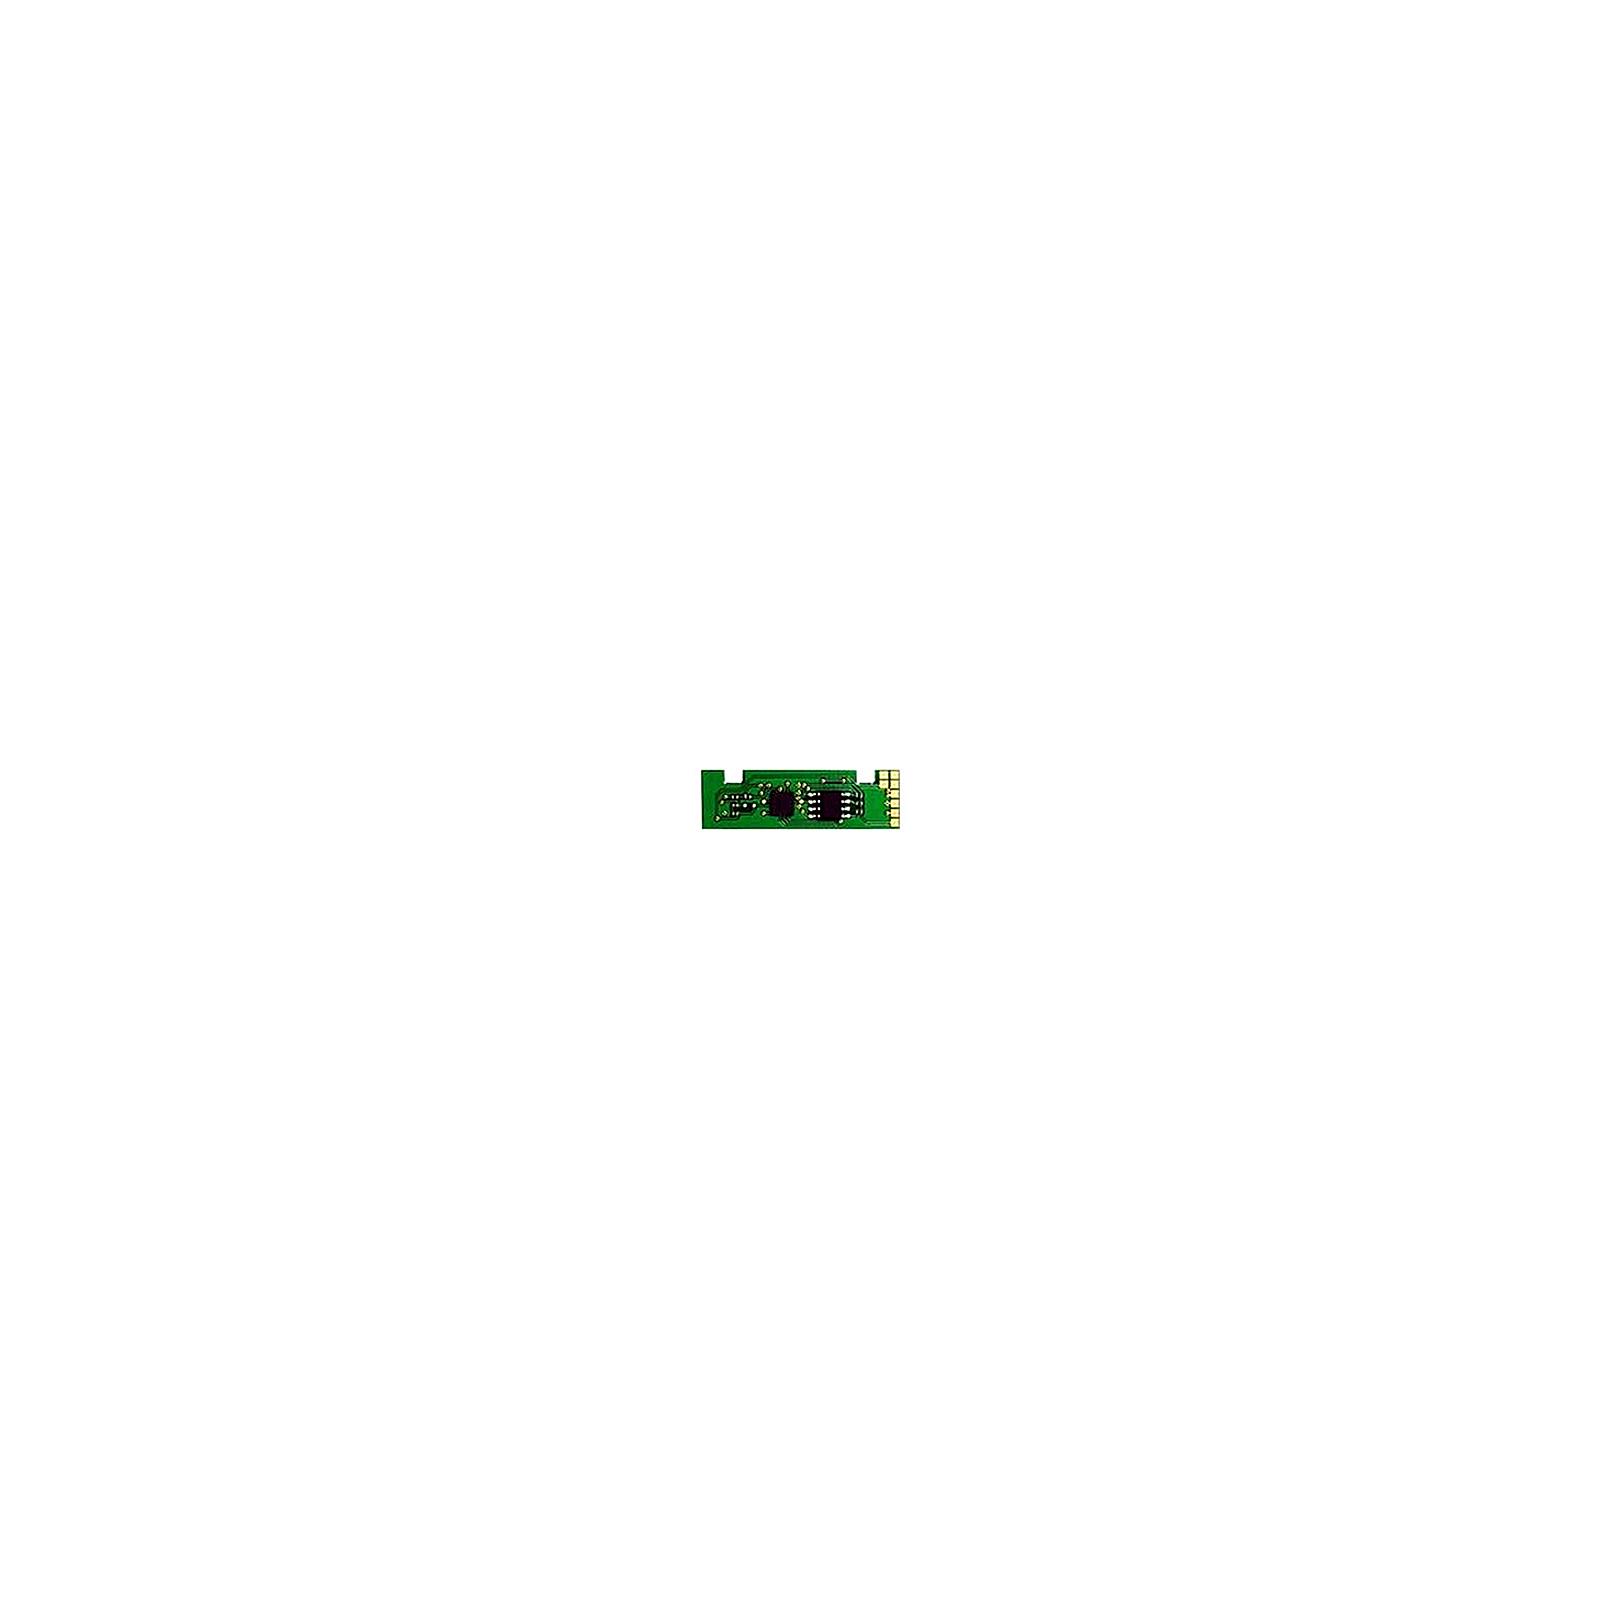 Чип для картриджа Xerox Phaser 3330 (106R03621) 8.5k Static Control (X3330CP-HYLA)